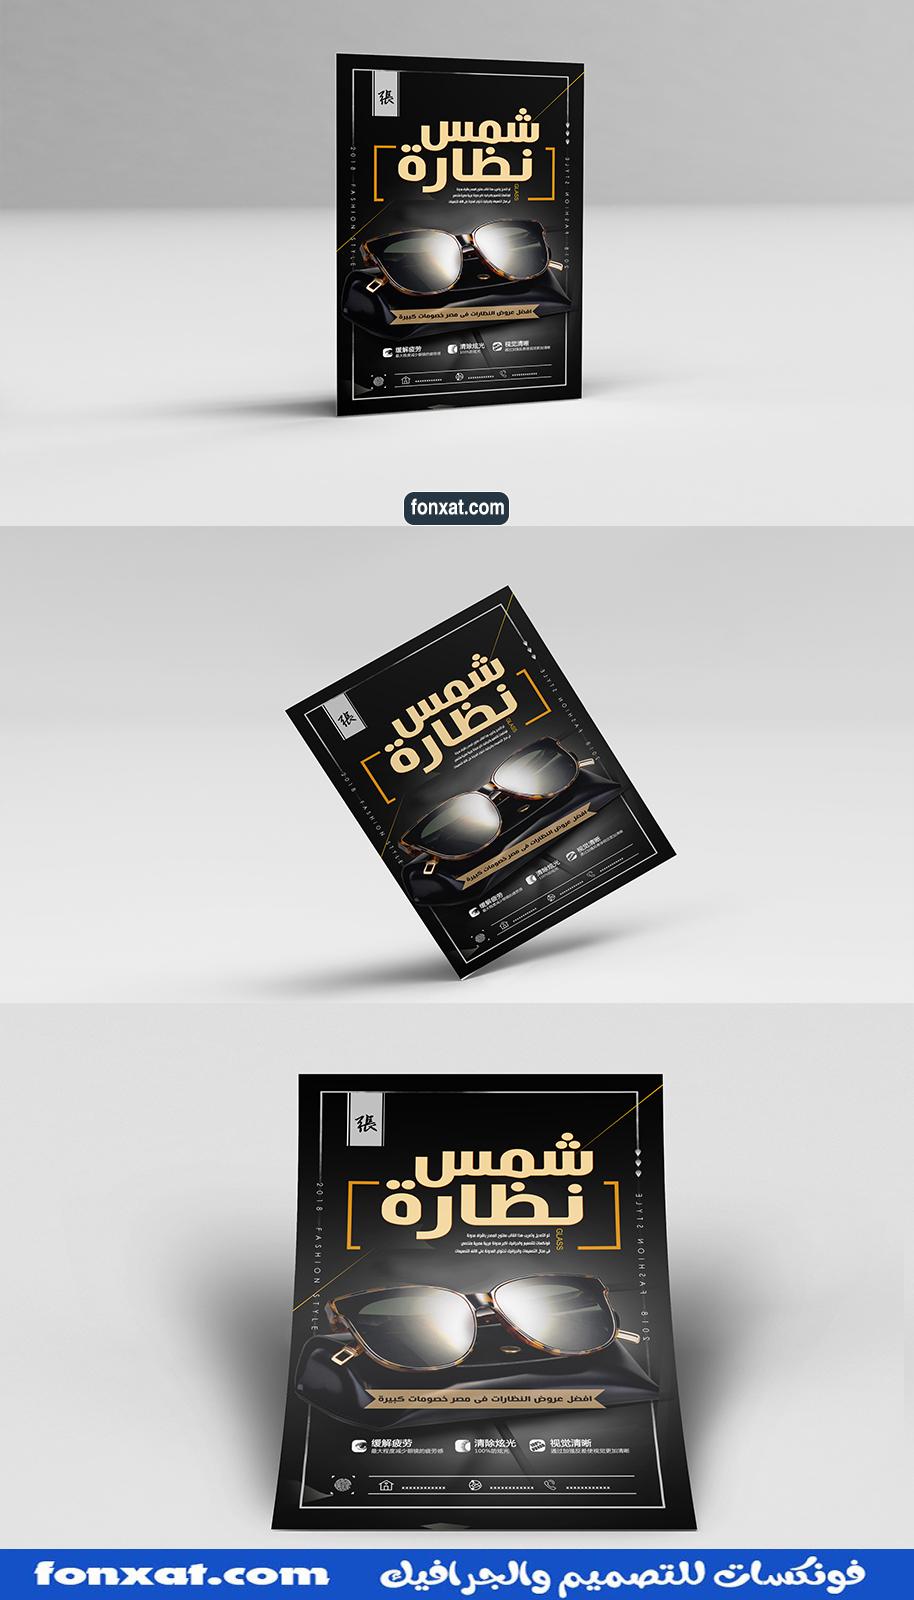 Fonxat Gfx Psd Designs Design Personalized Items